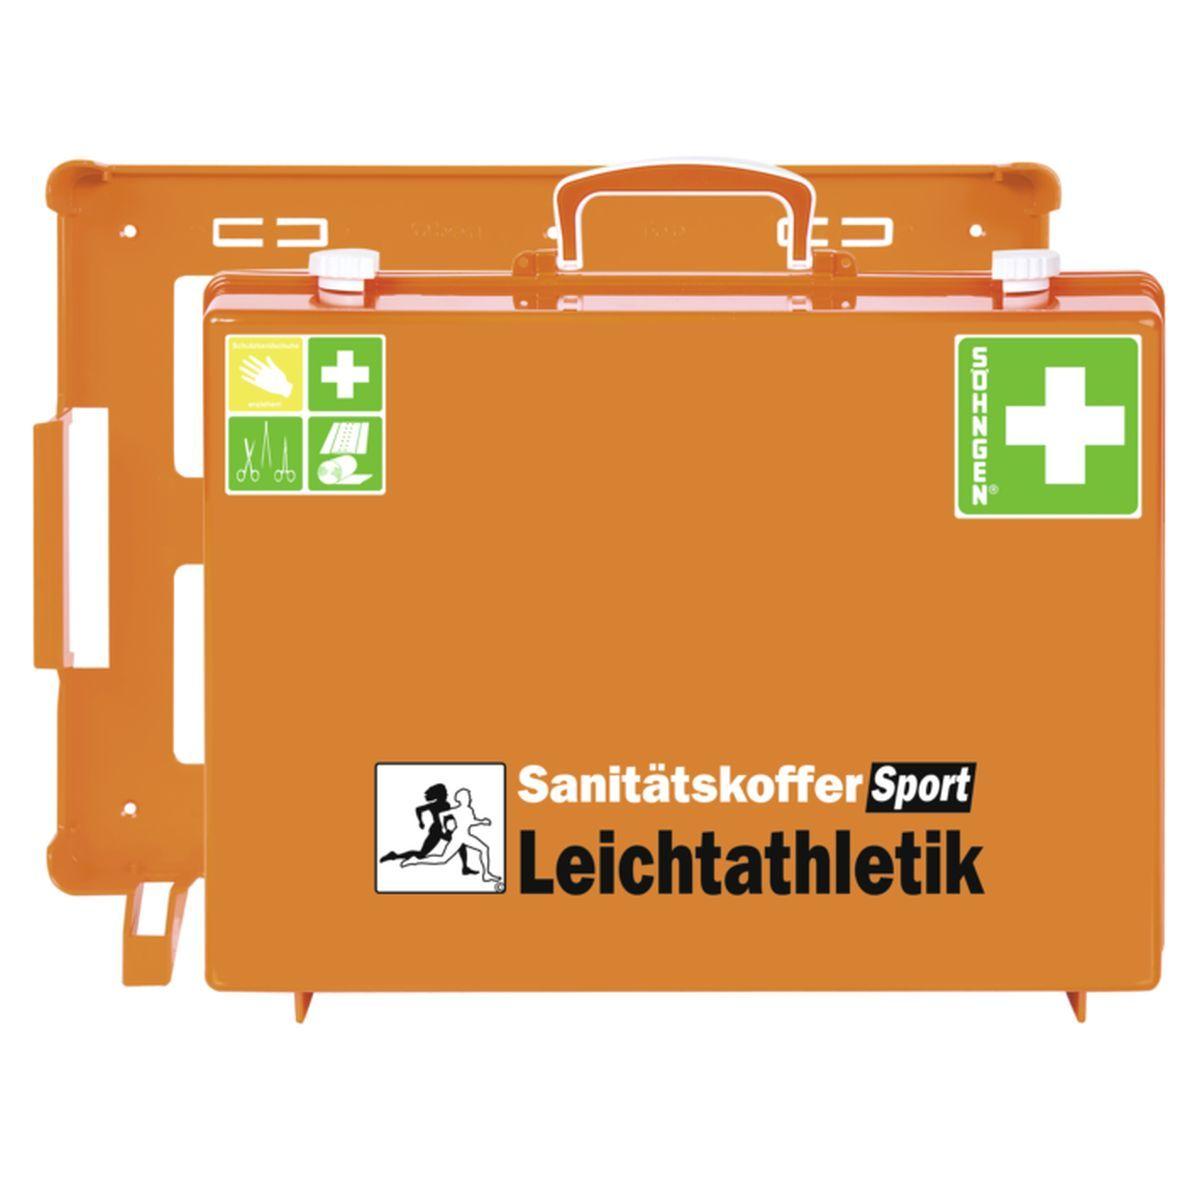 Sanitätskoffer Sport Leichtathletik